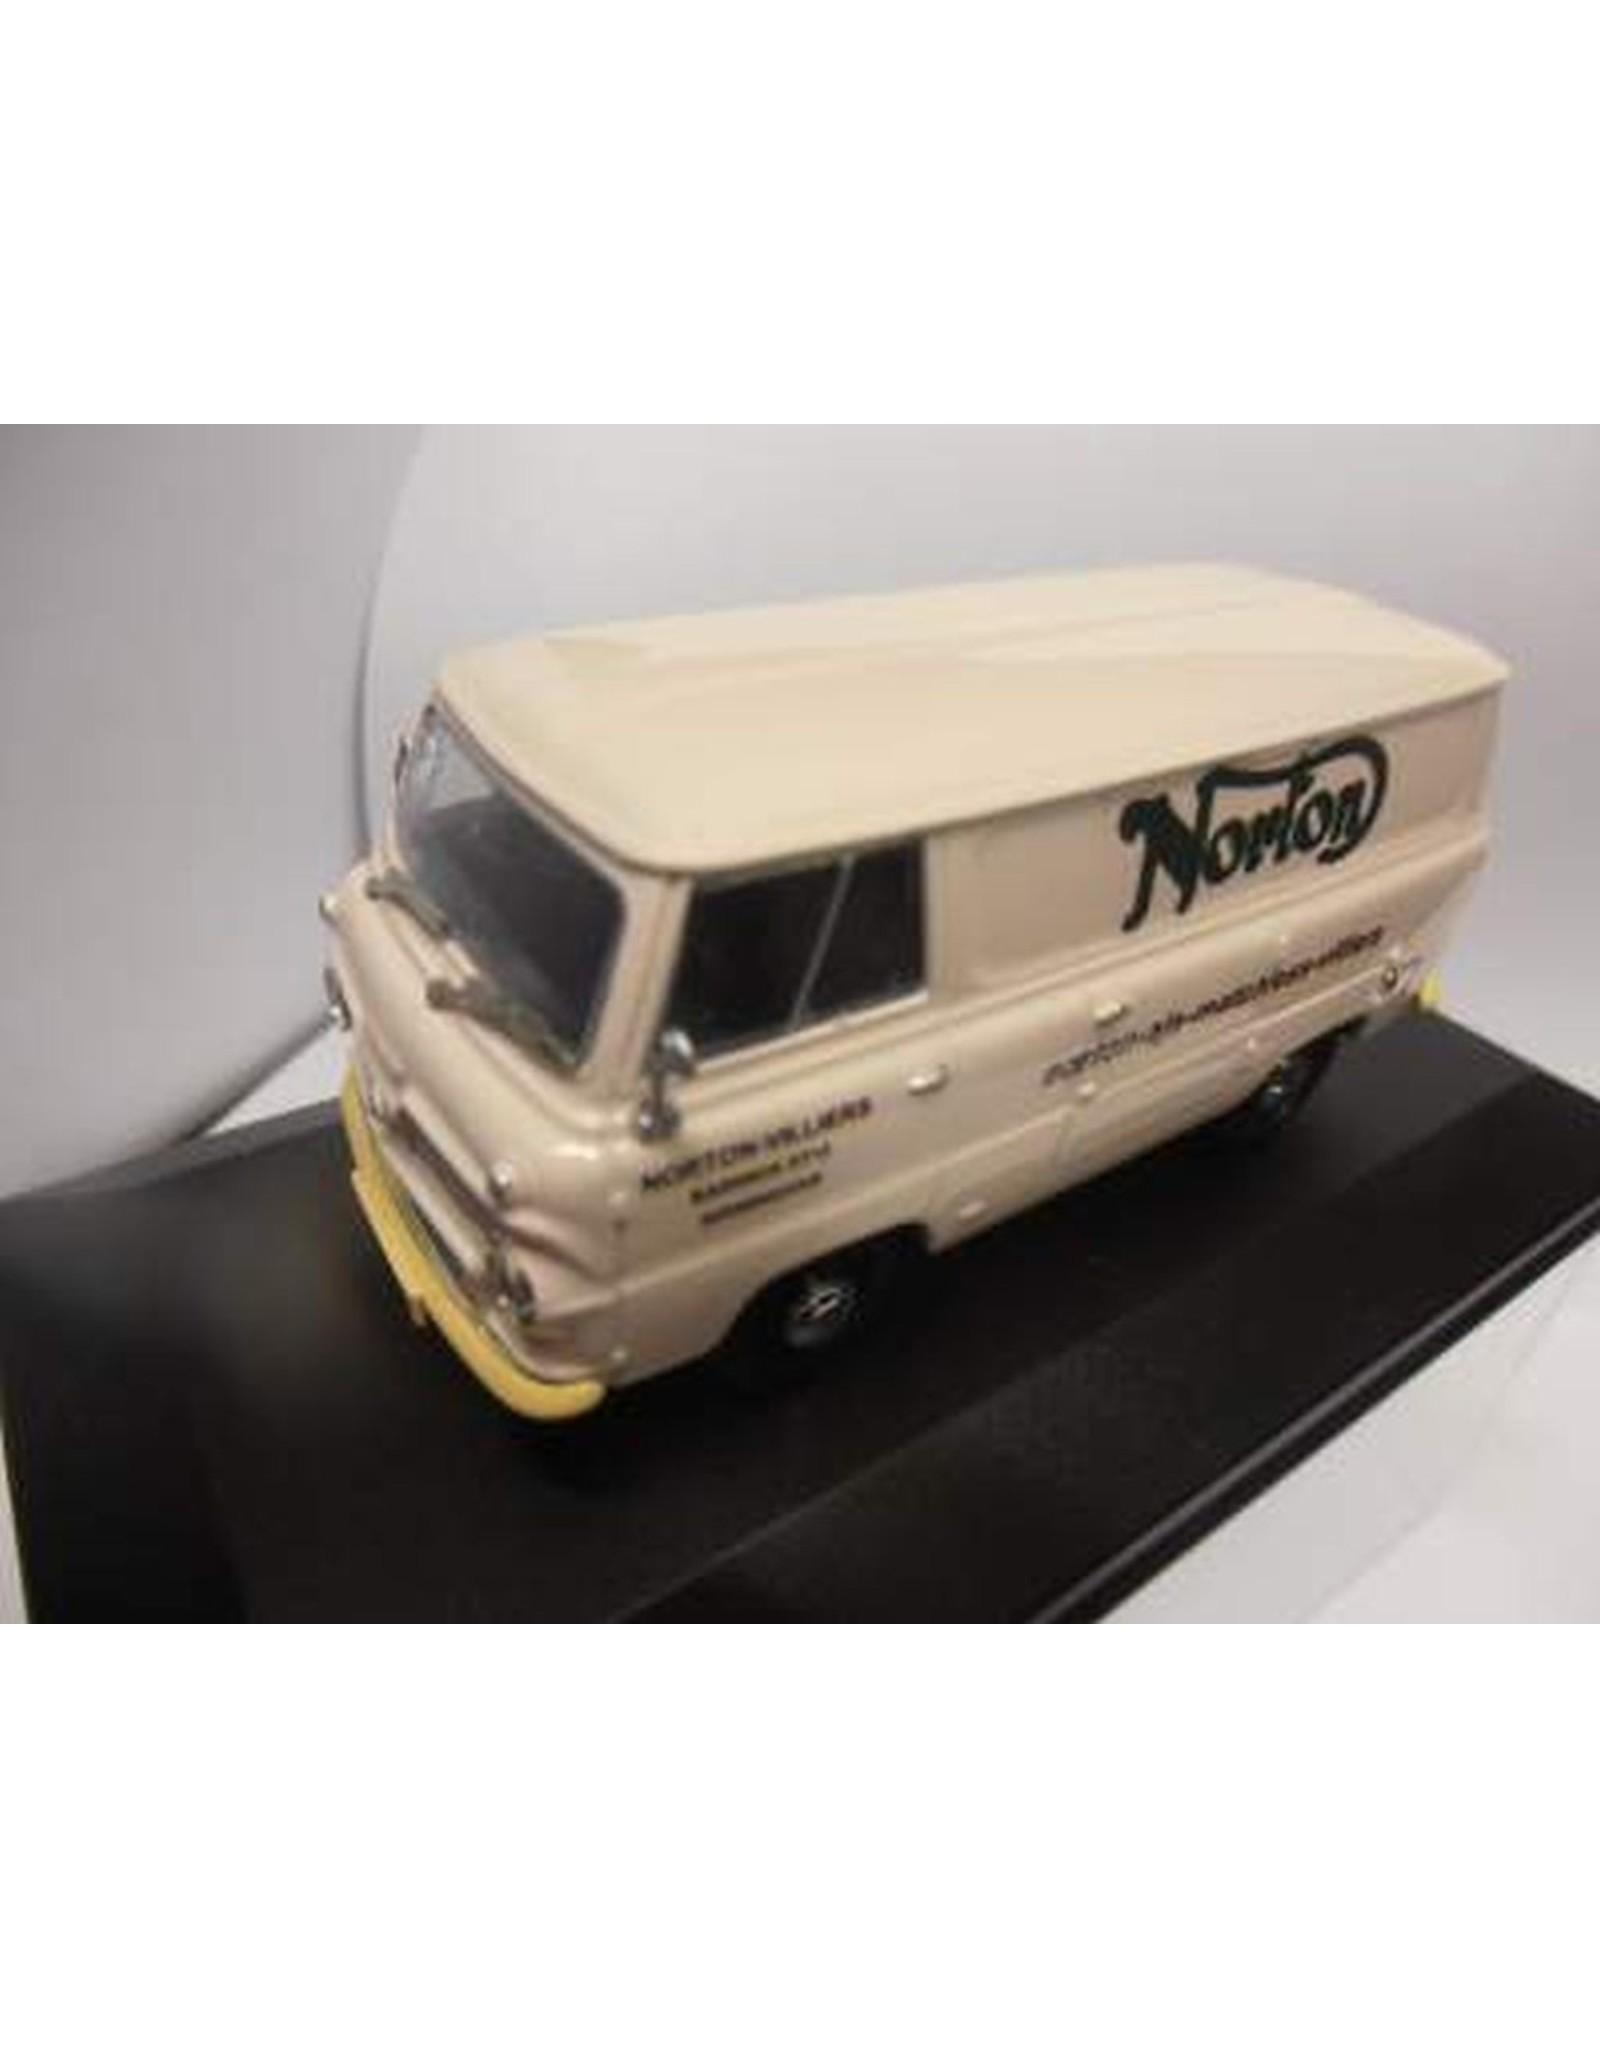 "Ford Europe FORD THAMES 400E NORTON"""""